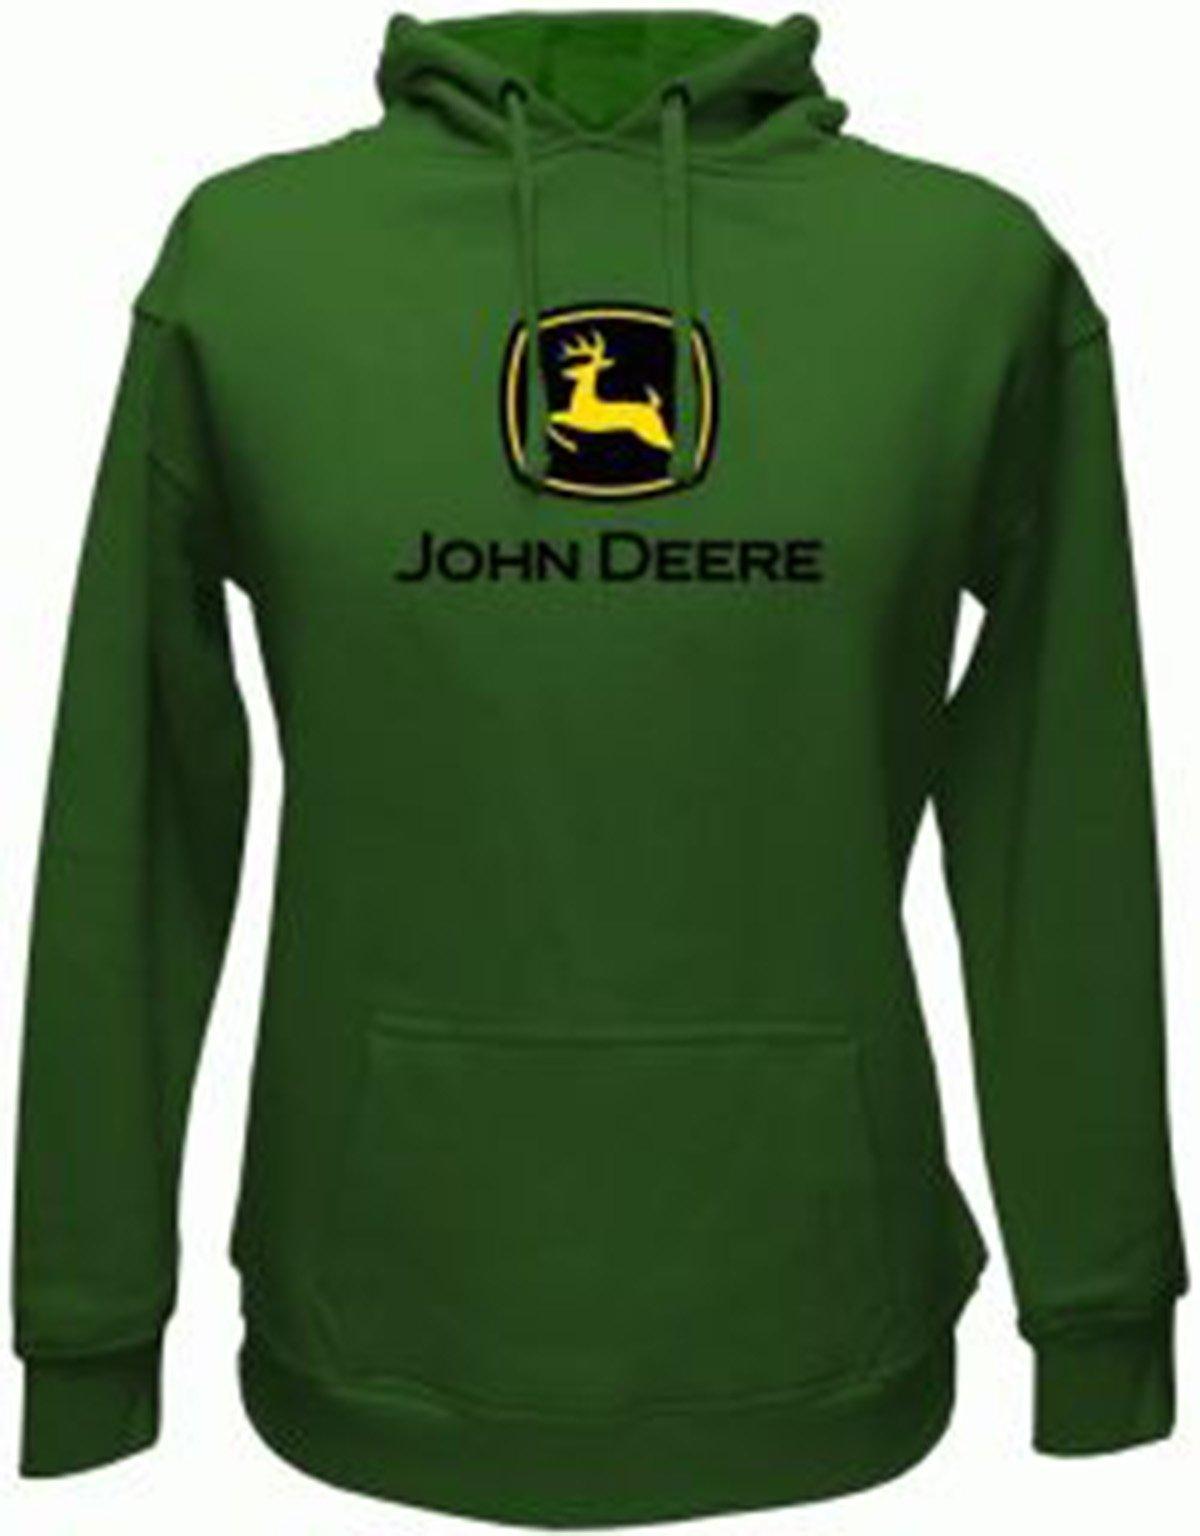 John Deere Men's Trademark Logo Core Hood Pullover Fleece, Green, Large